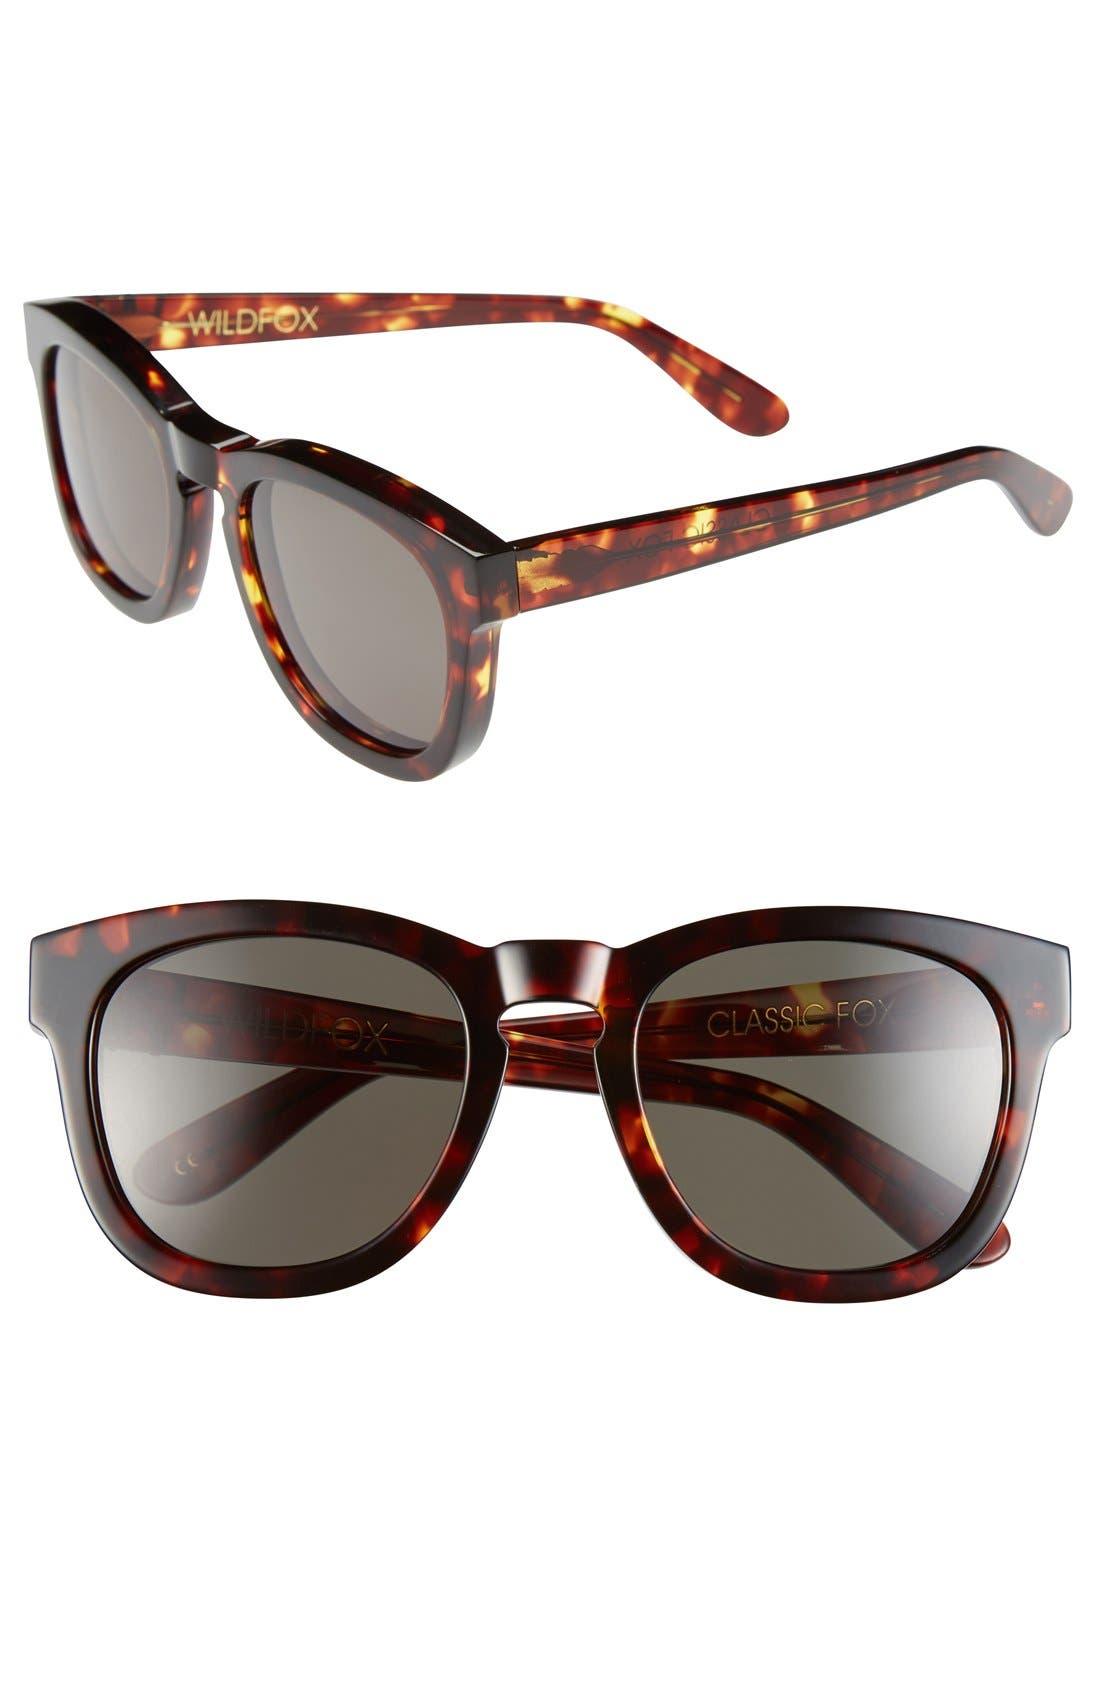 'Classic Fox' 50mm Retro Sunglasses,                             Main thumbnail 11, color,